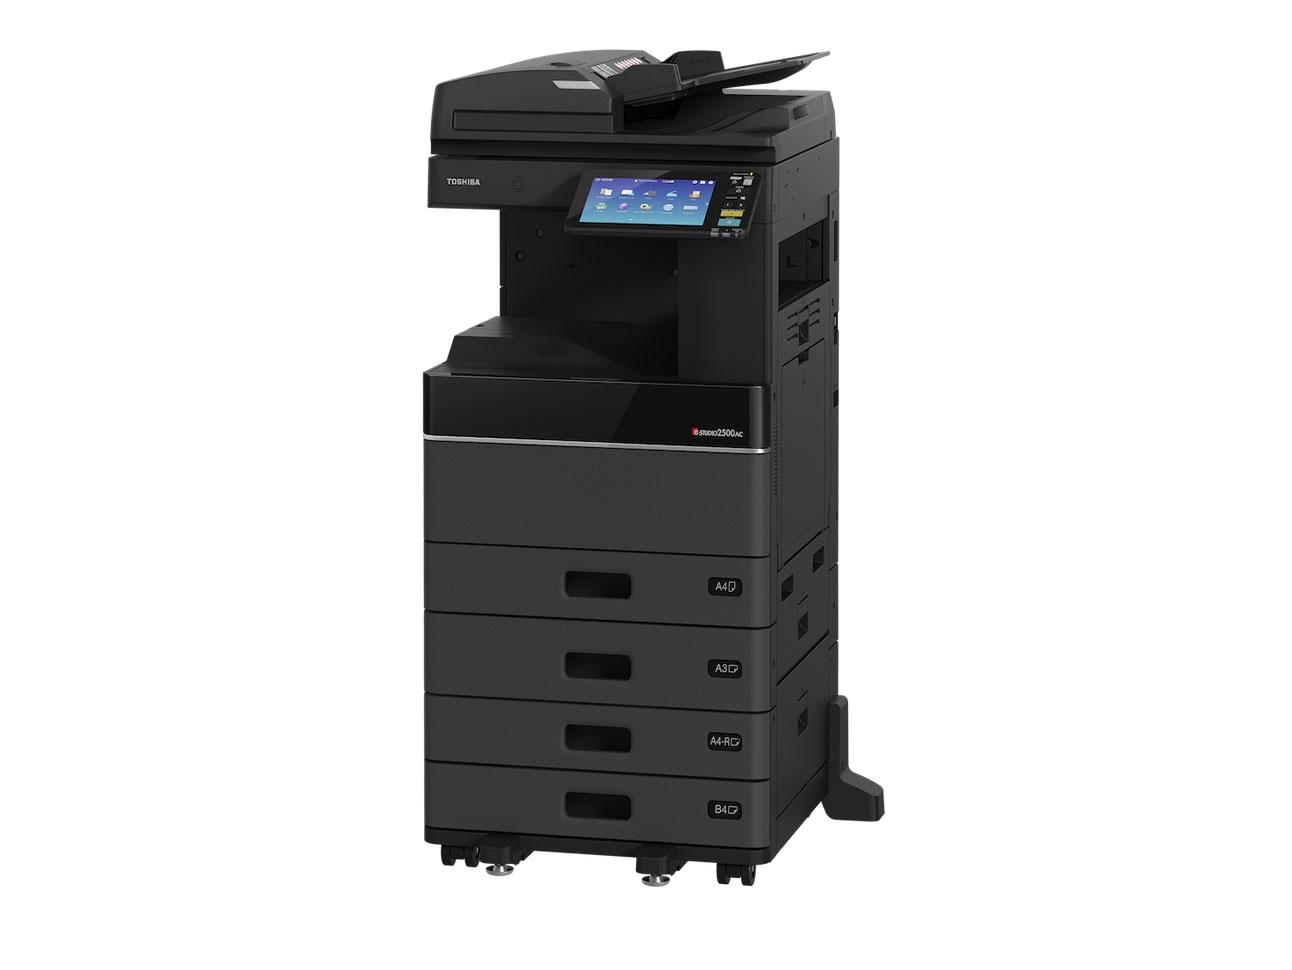 Fotocopiadora Toshiba e-STUDIO 2500AC Barata